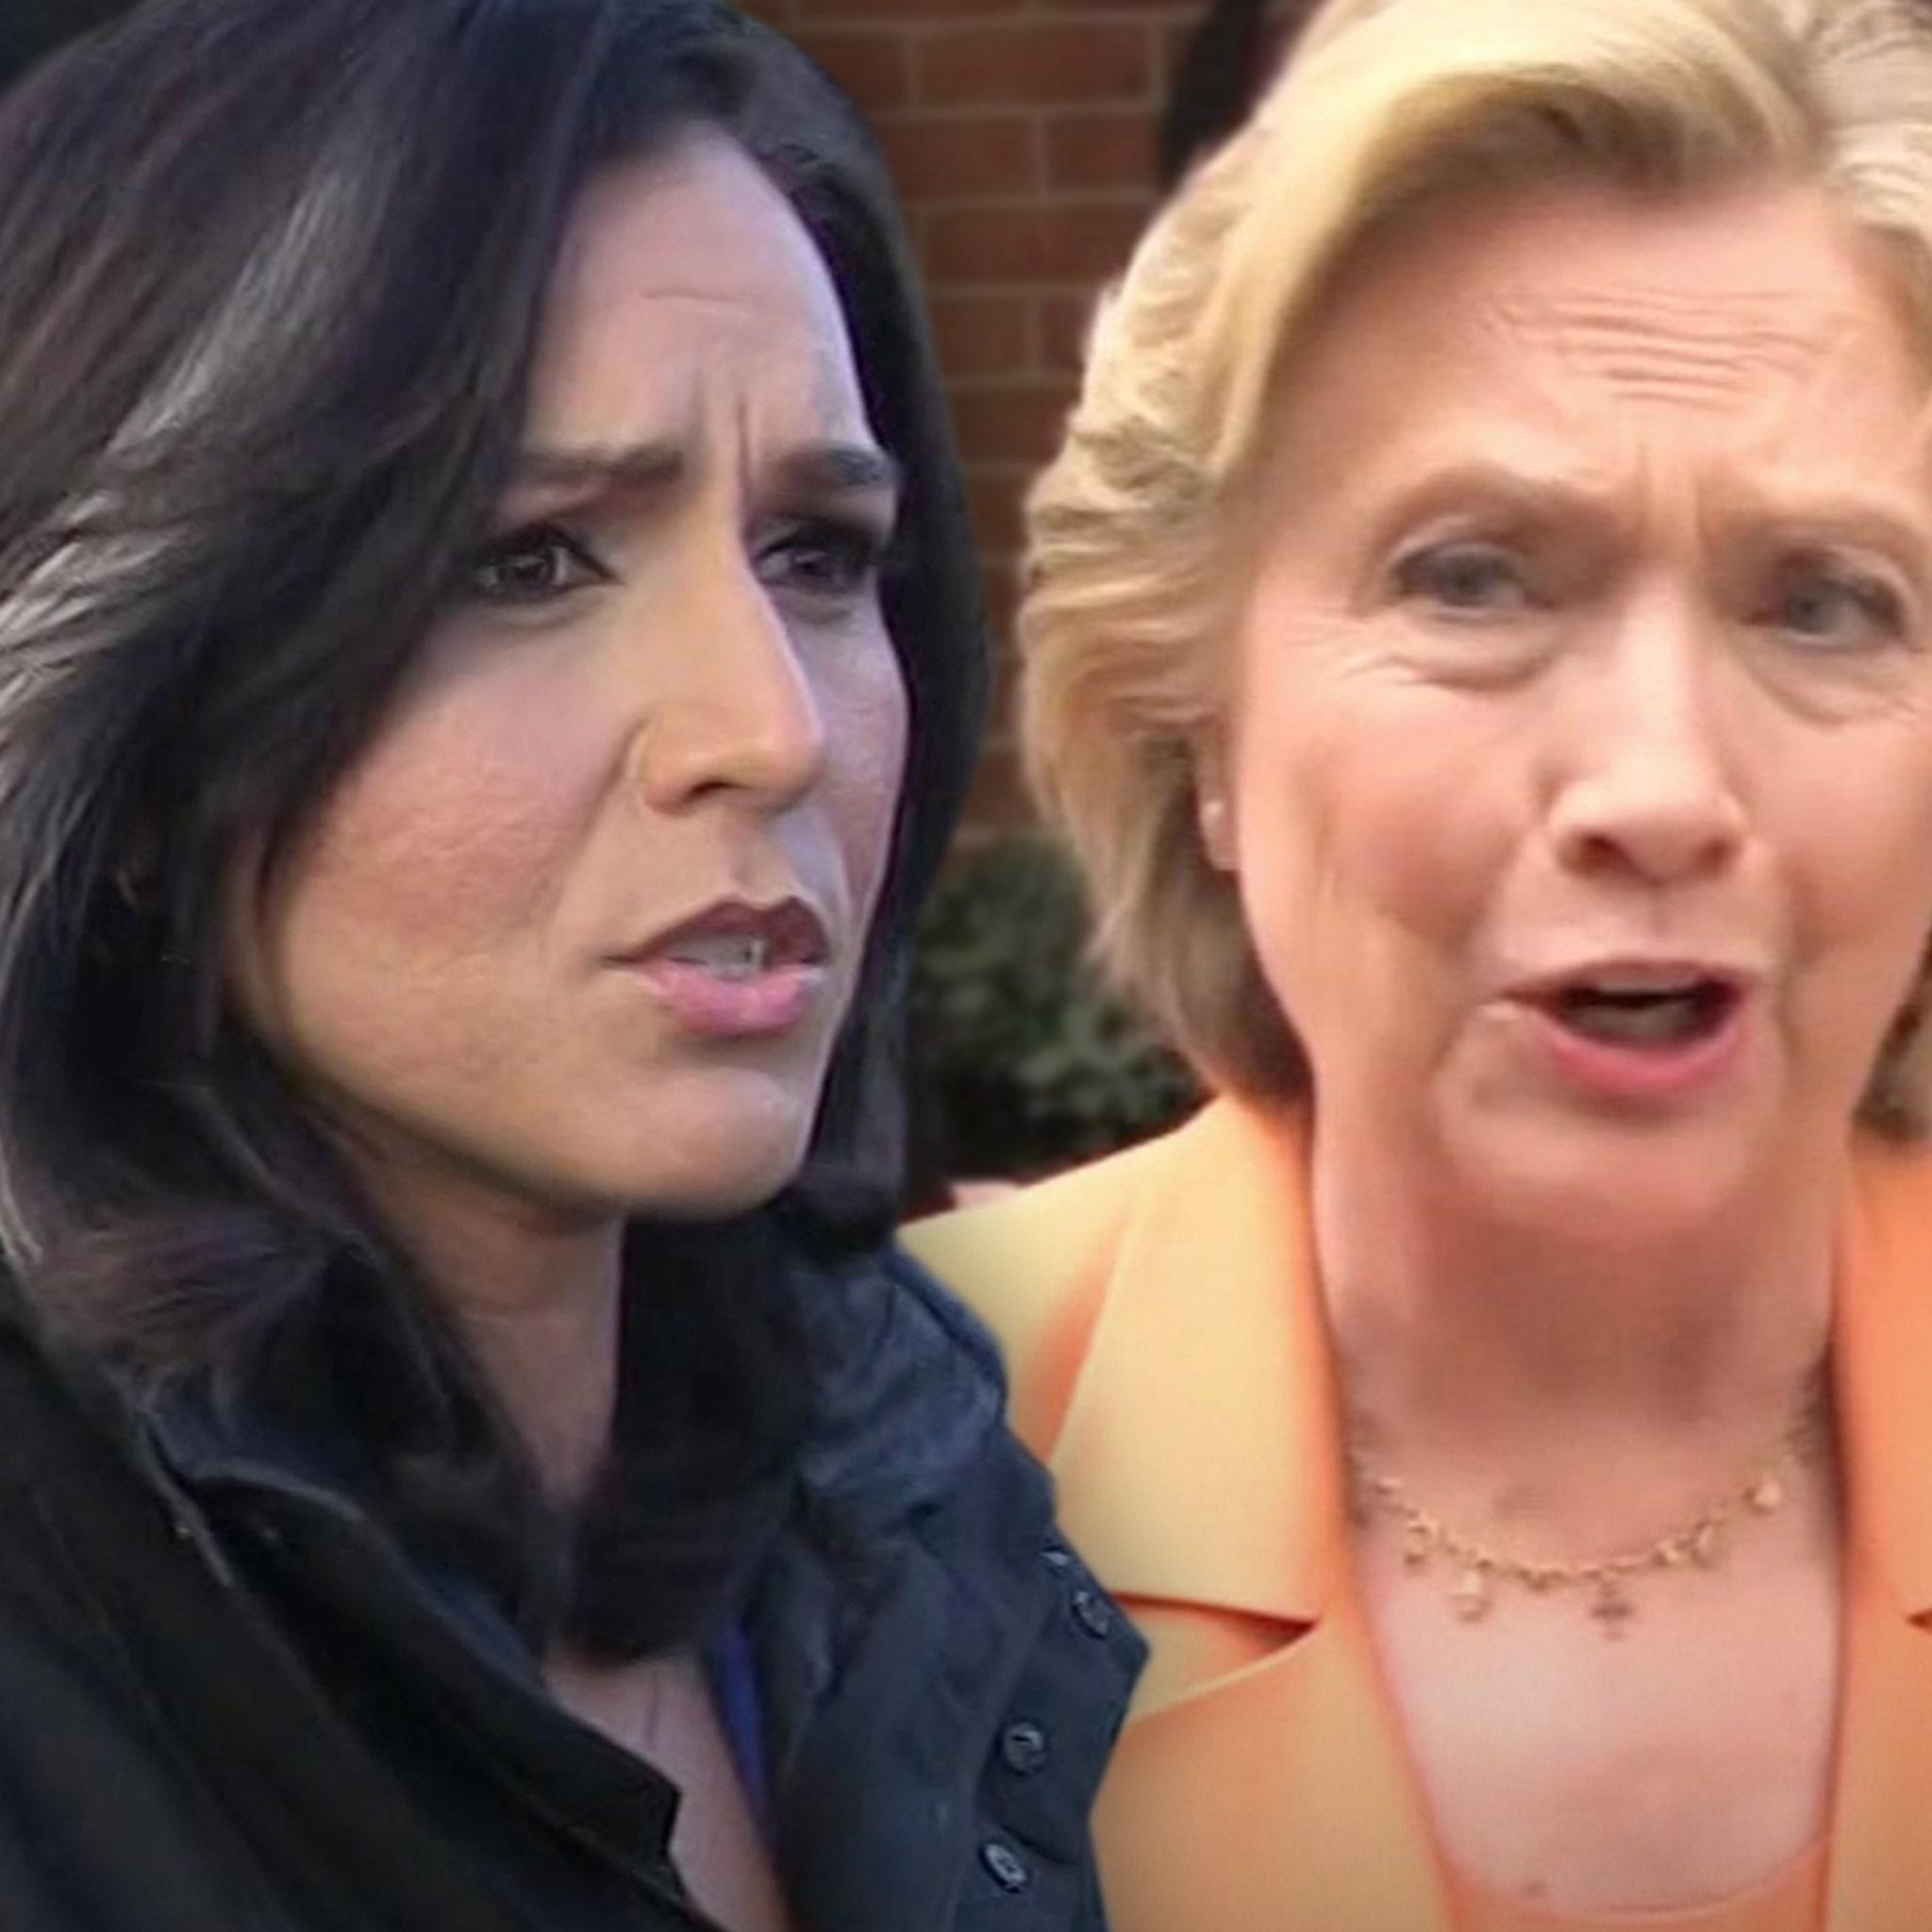 Rep. Tulsi Gabbard Sues Hillary Clinton for Defamation Over 'Russian' Claim